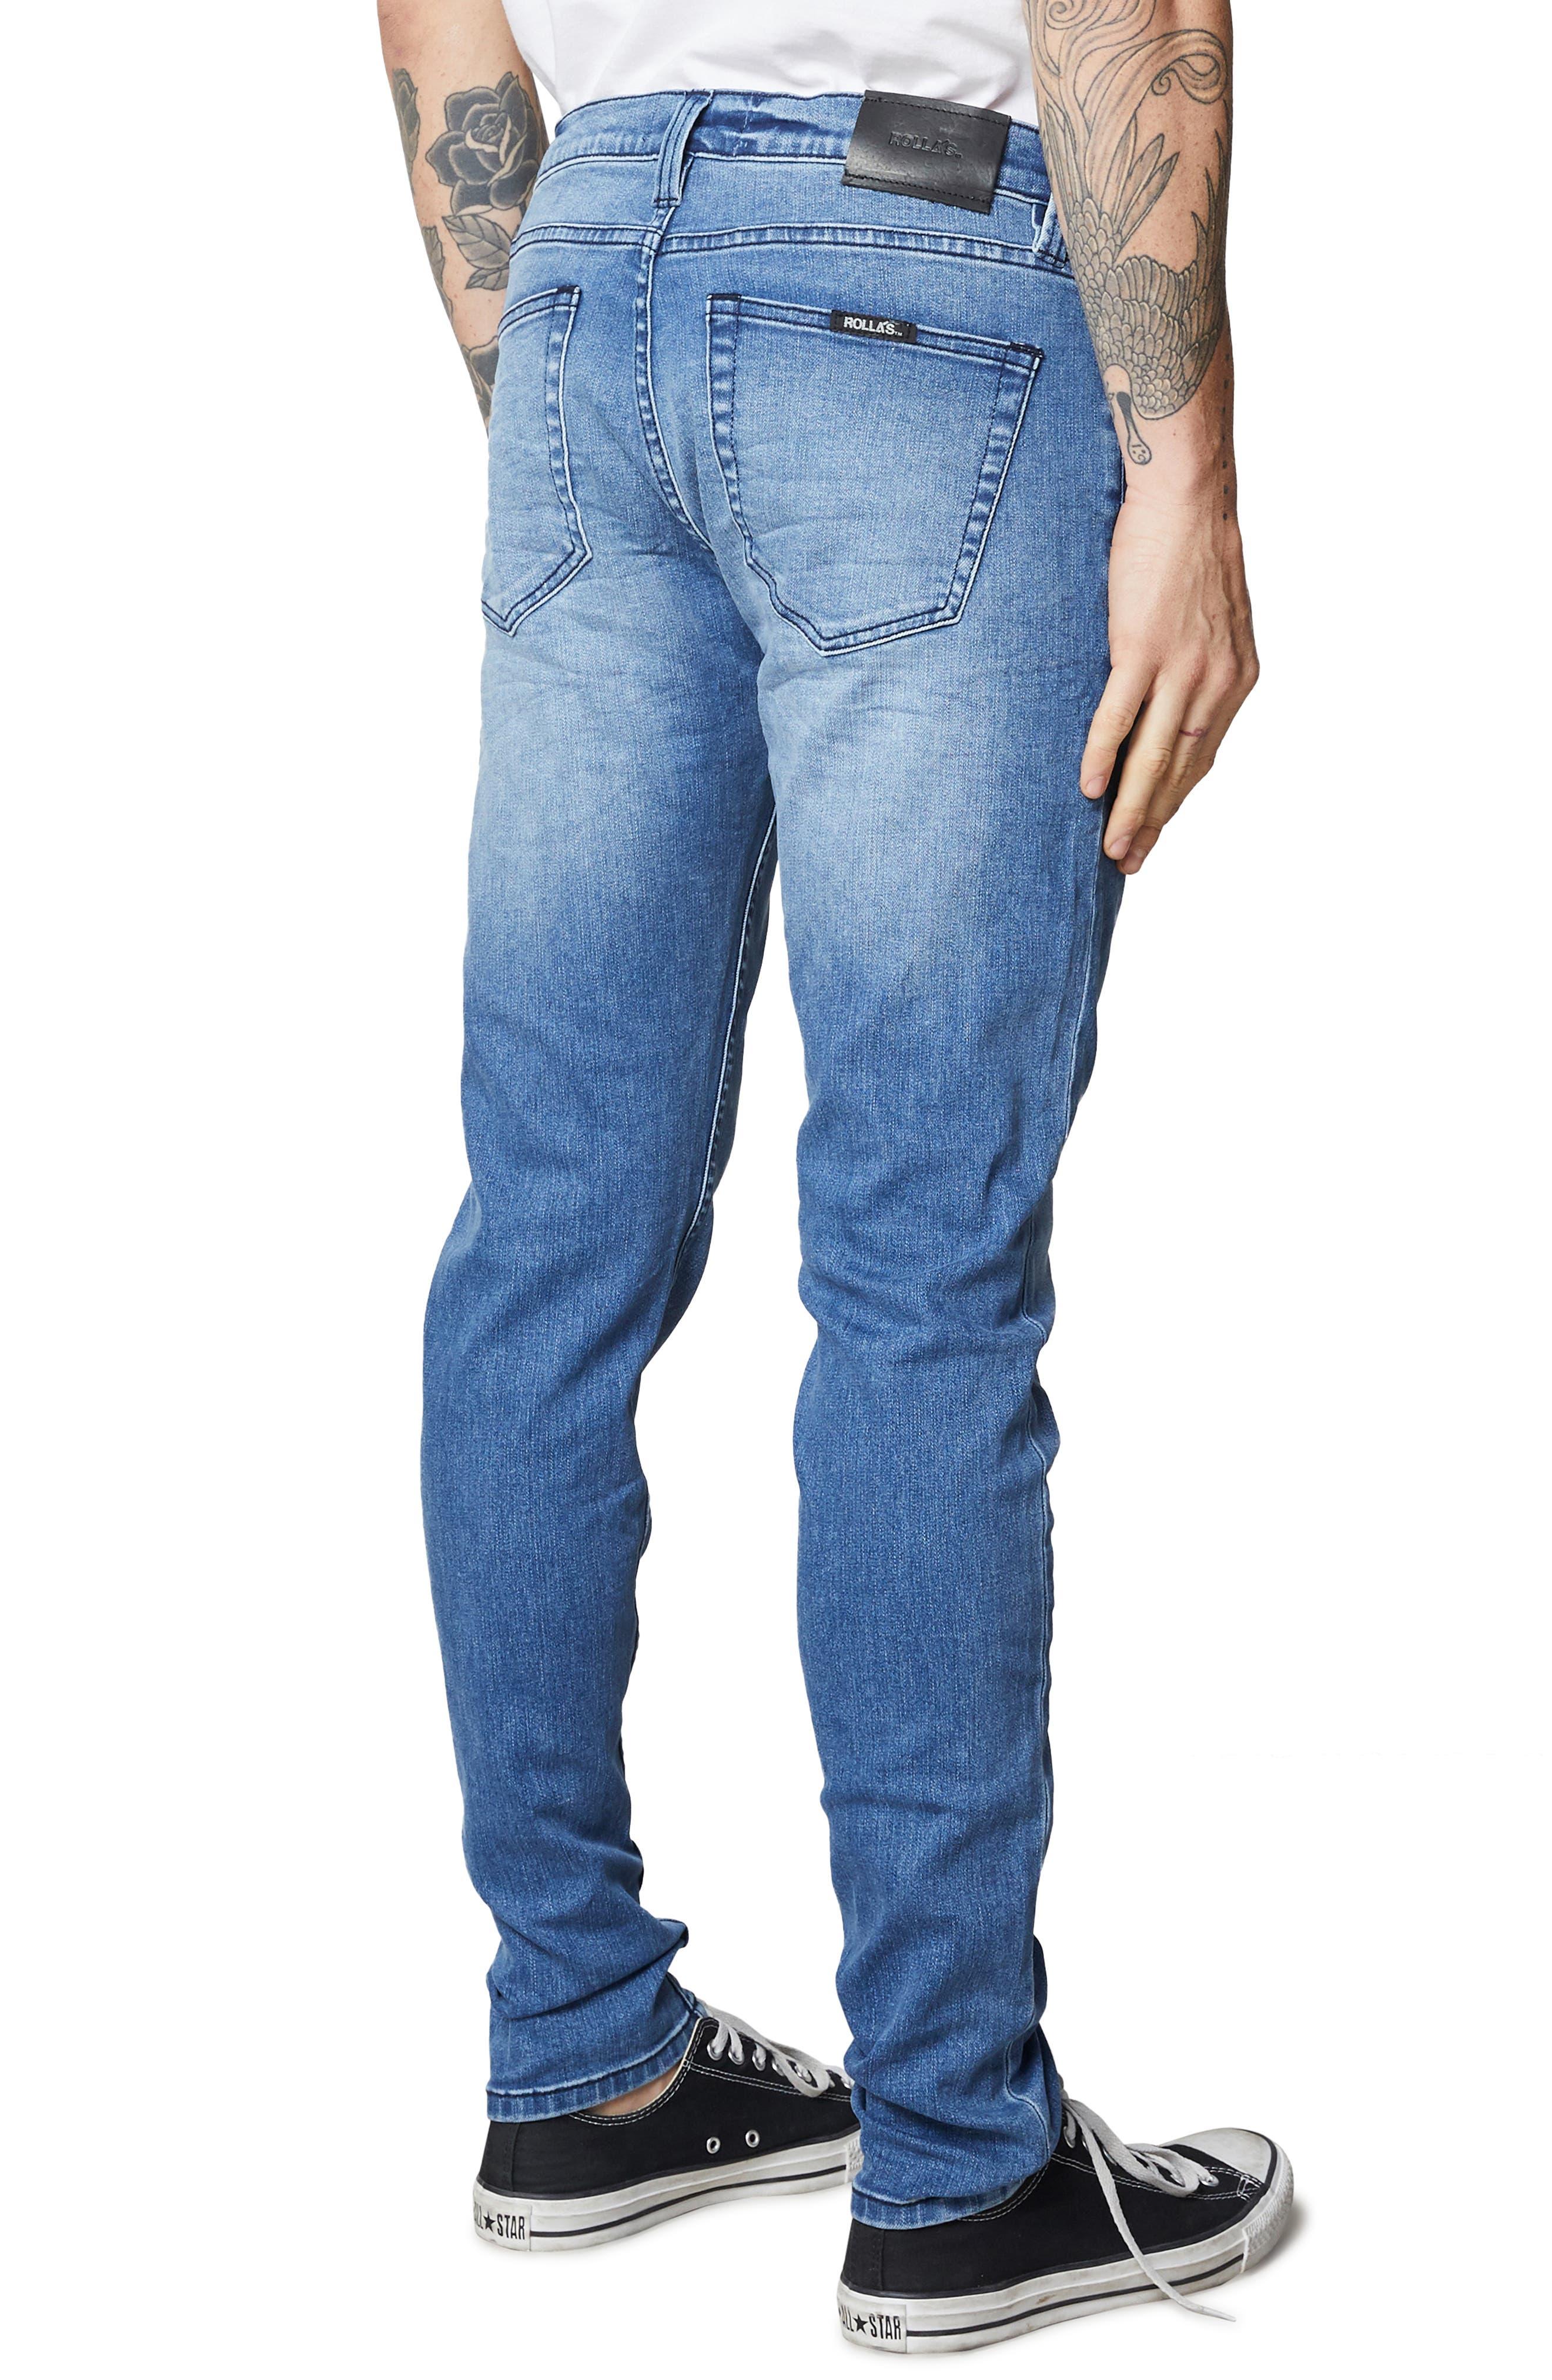 Stinger Skinny Fit Jeans,                             Alternate thumbnail 4, color,                             TRUE BLUE